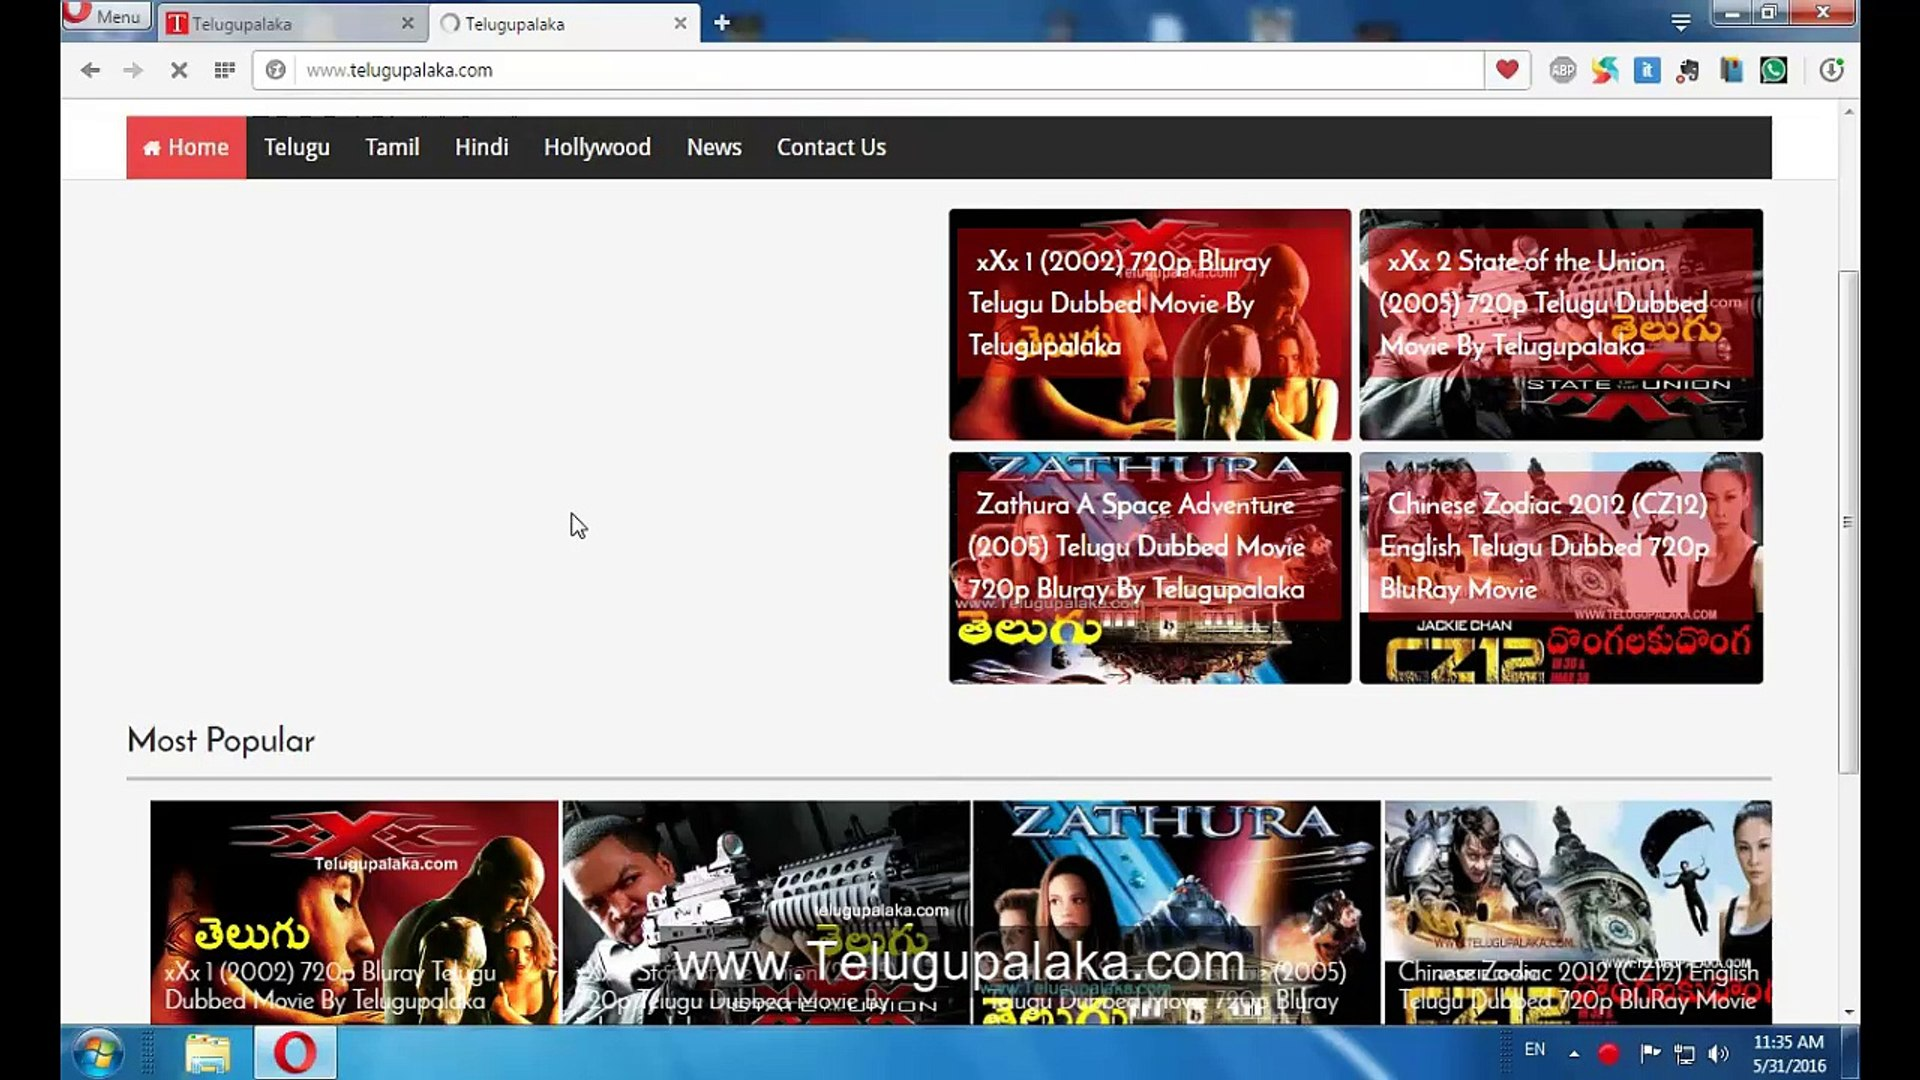 How To Download Telugu Dubbed Movies From [www Telugupalaka com]